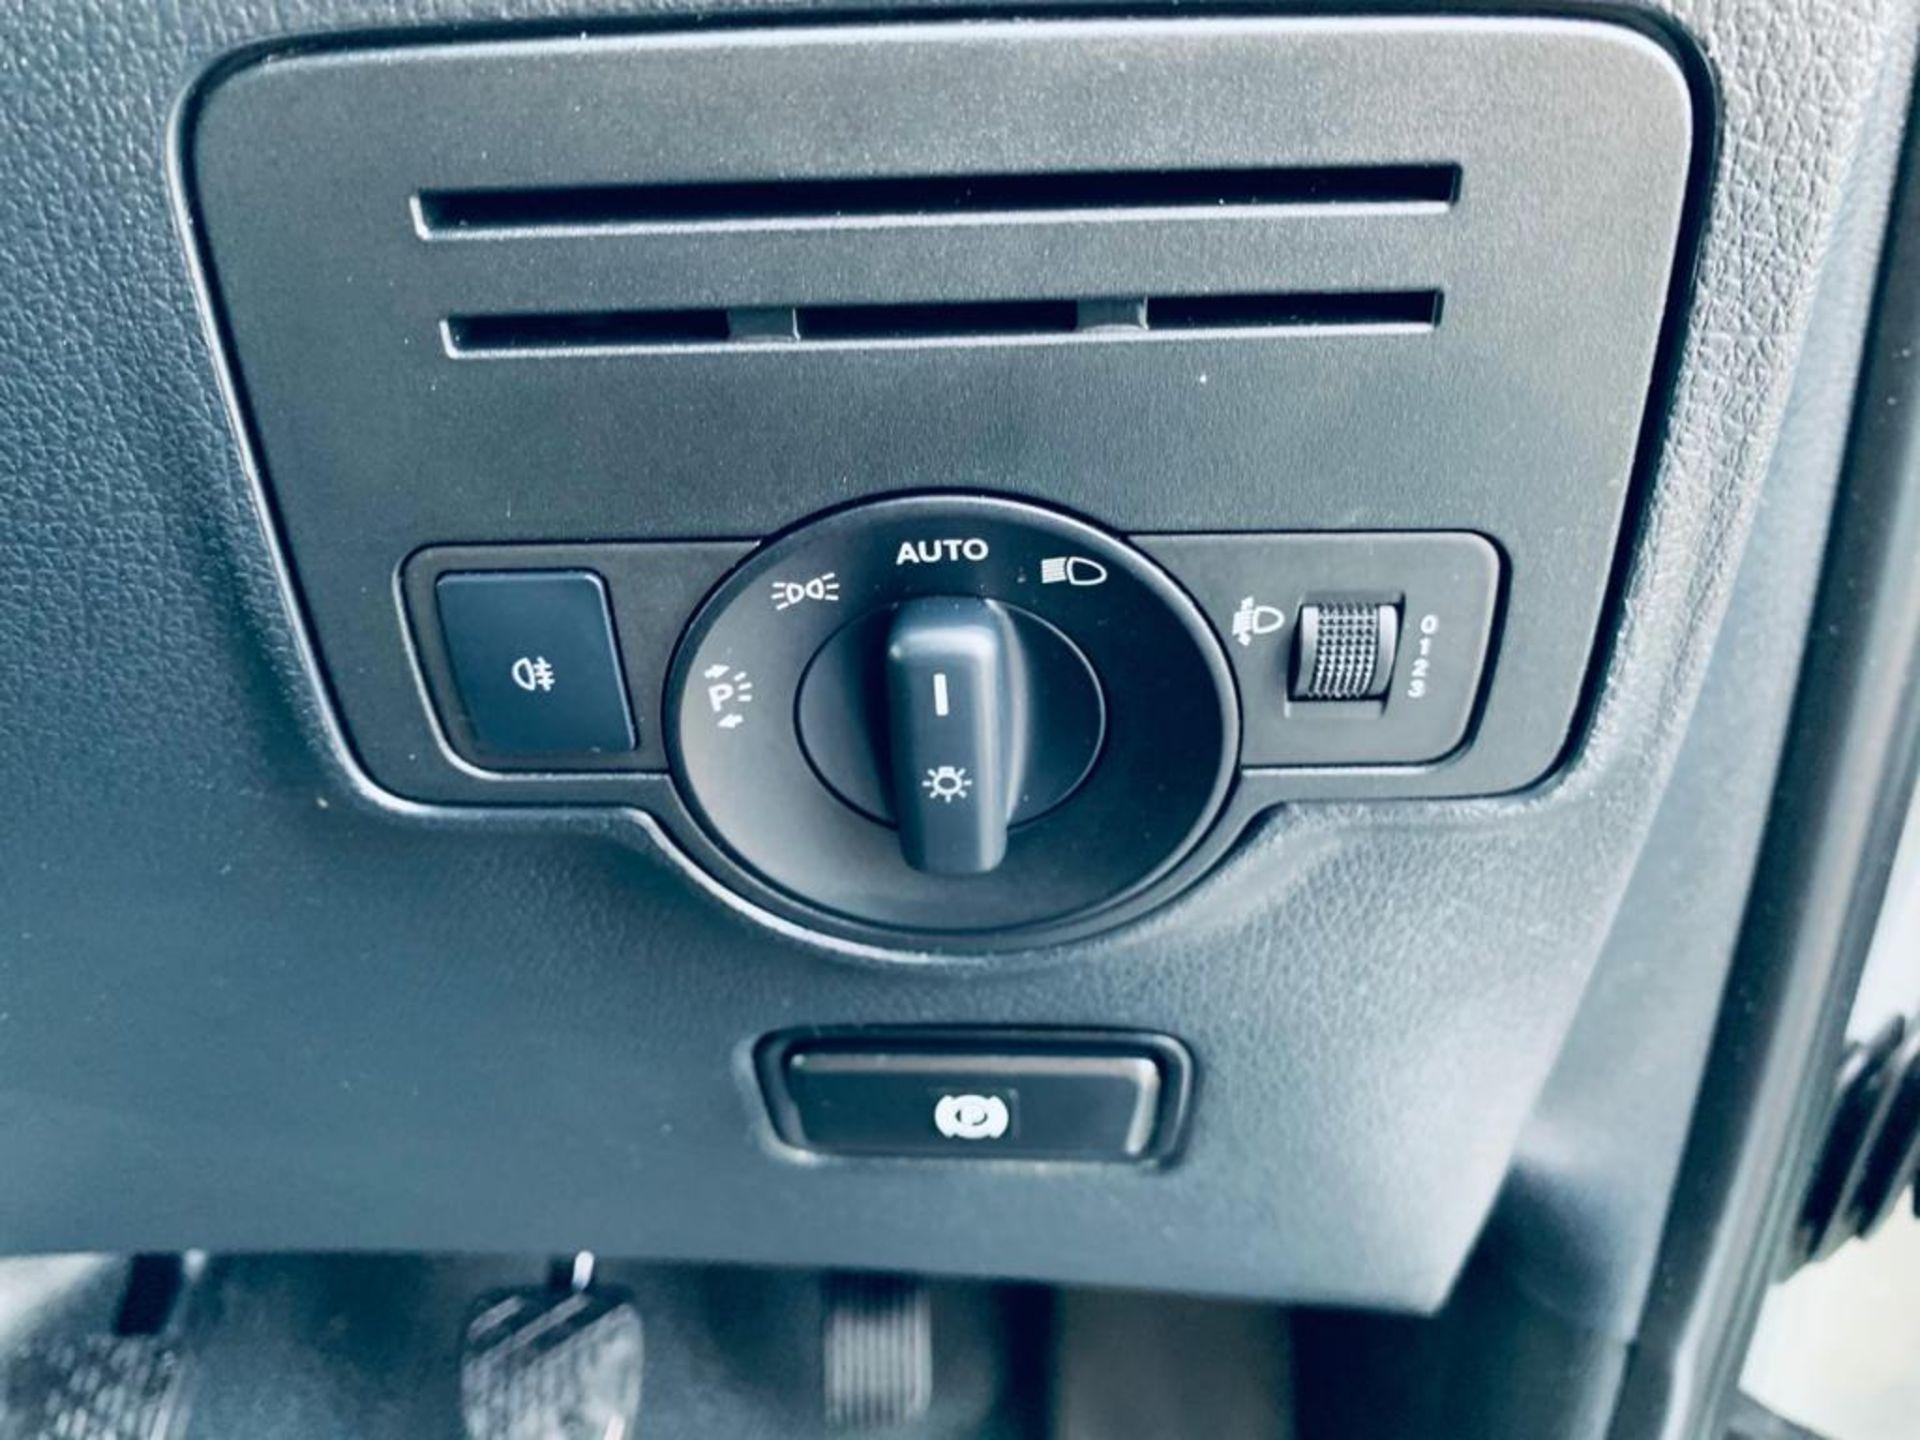 Reserve Met - Mercedes Vito 114CDI Bluetec 2018 18 Reg LWB - Air Con - Euro 6 - FSH - ULEZ - 1 Owner - Image 24 of 26